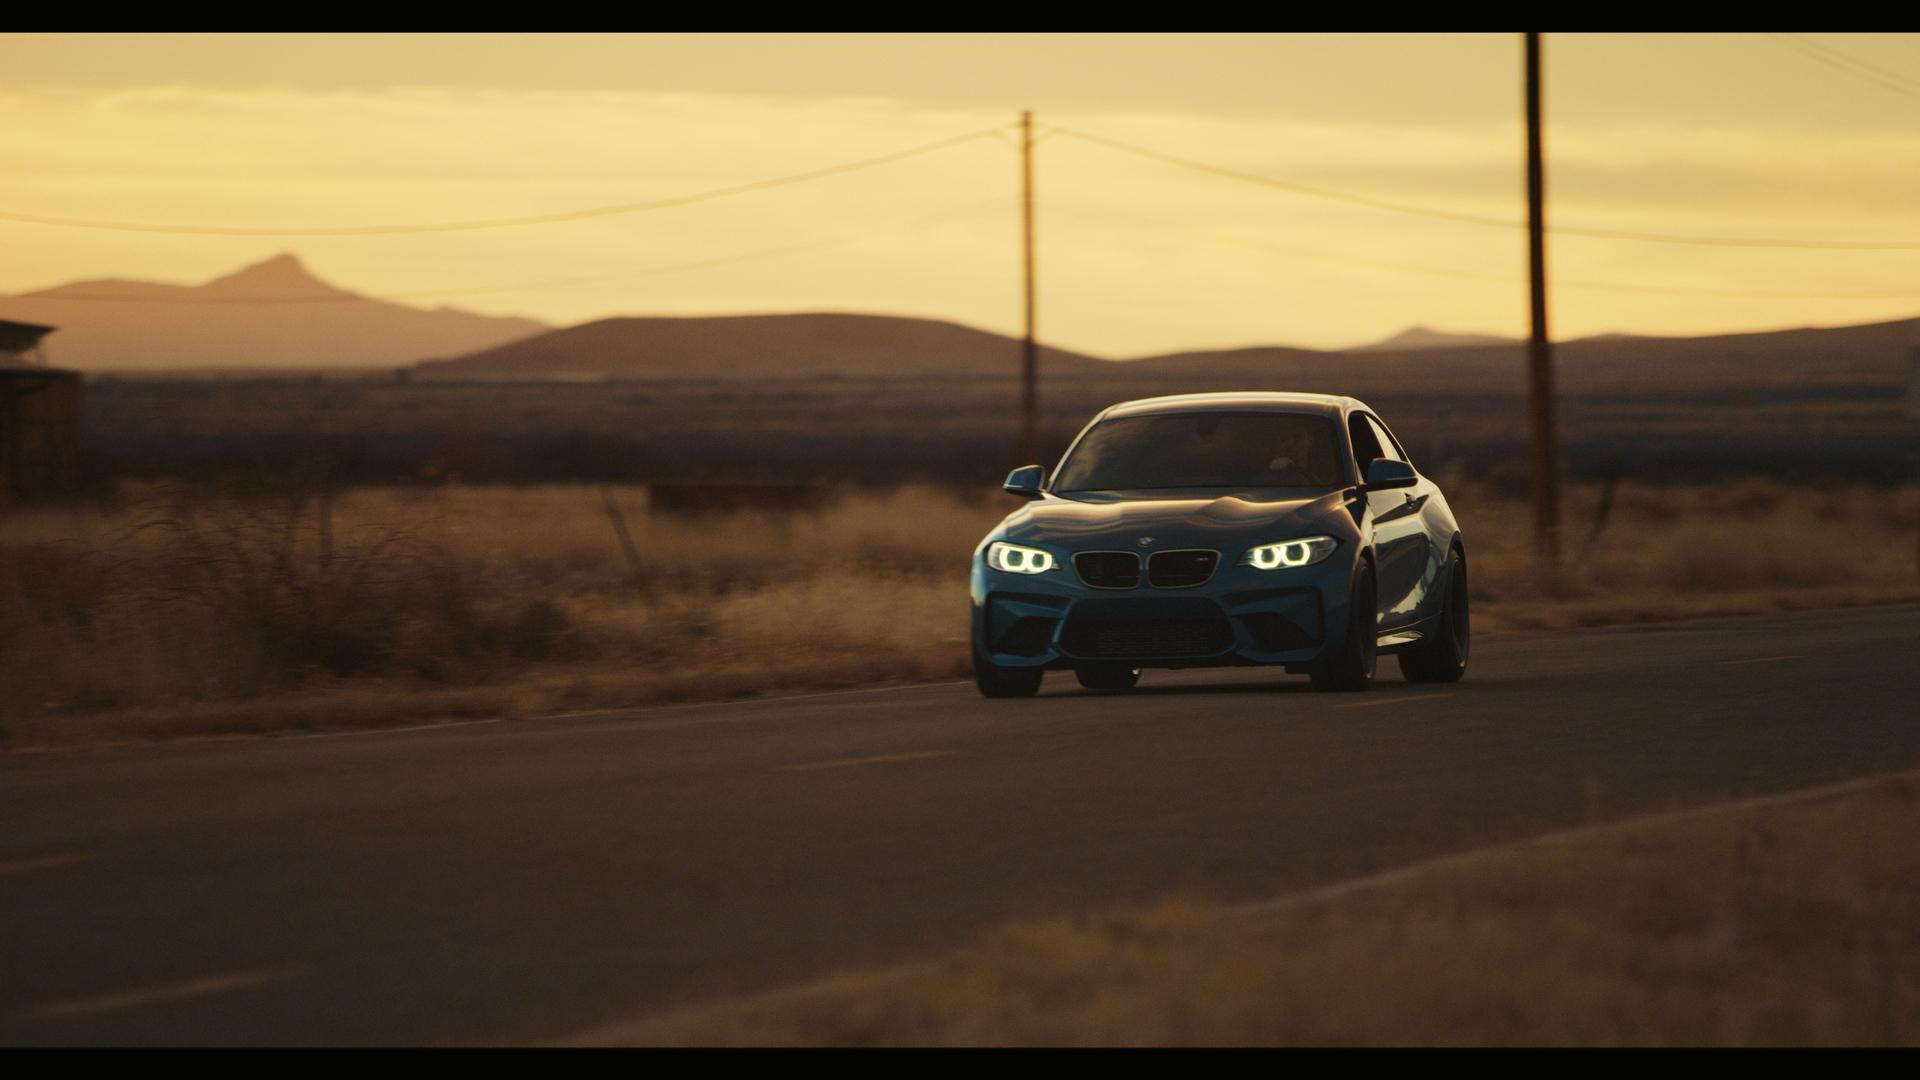 BMW_1.44.1.jpg